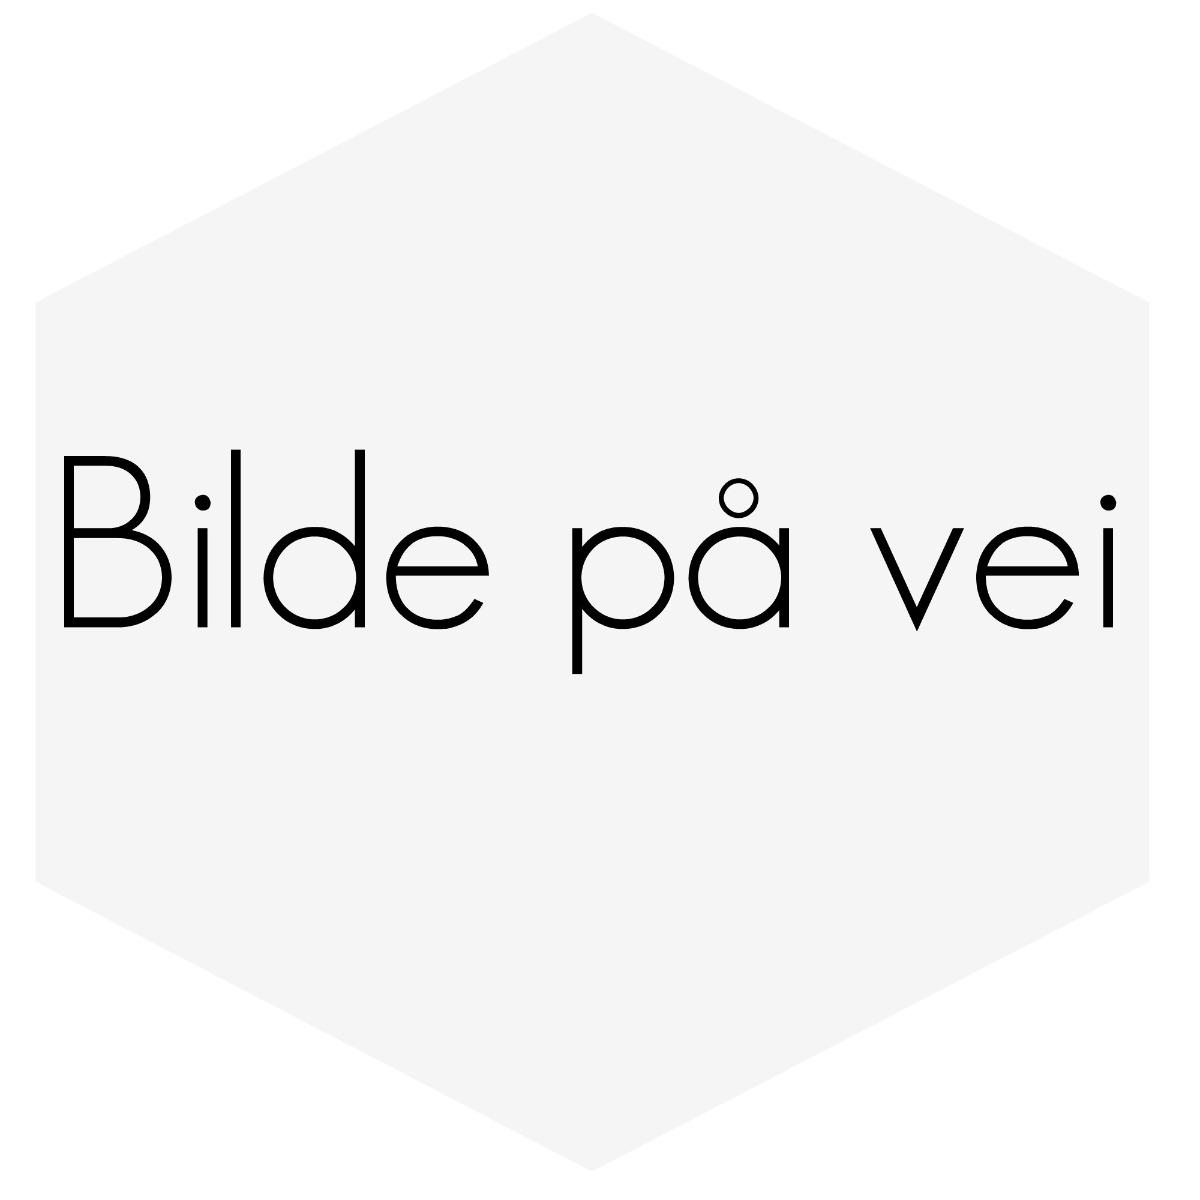 ØYELOKK I EKTE CARBON 850-92-97 MED STD LAMPER OG STYLING